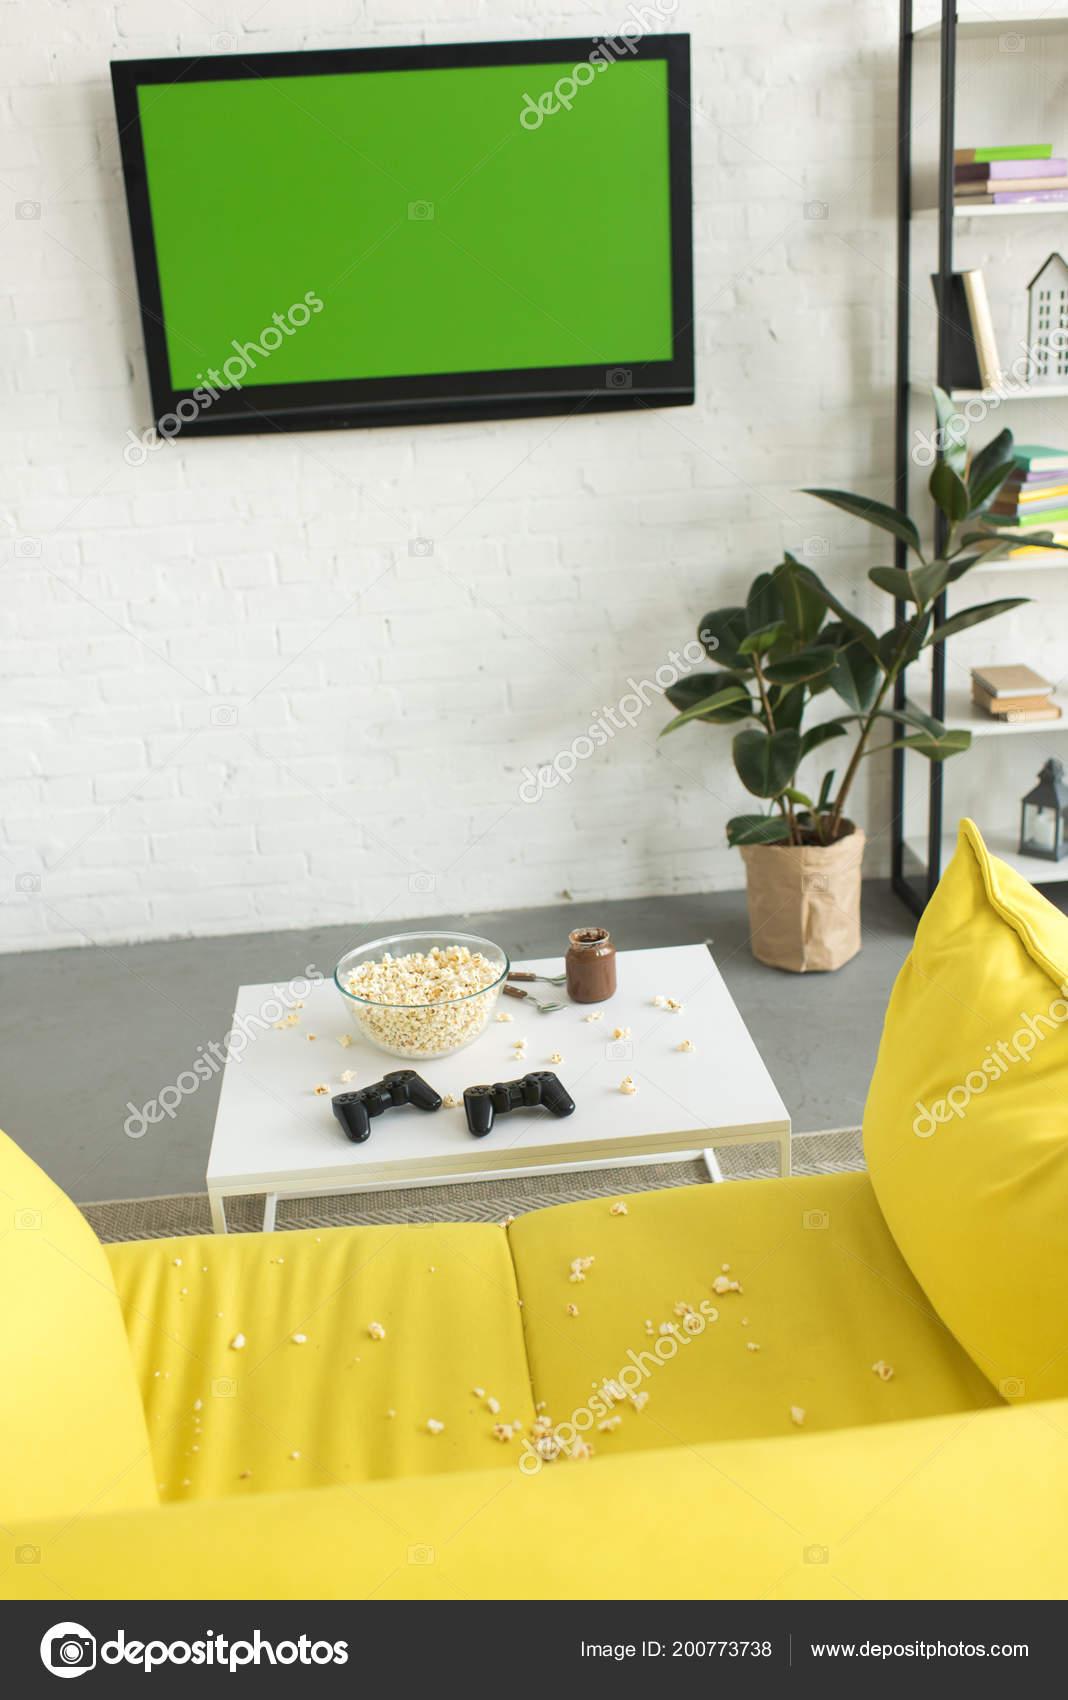 High Angle View Glass Bowl Popcorn Joysticks Table Yellow Sofa U2014 Stock Photo